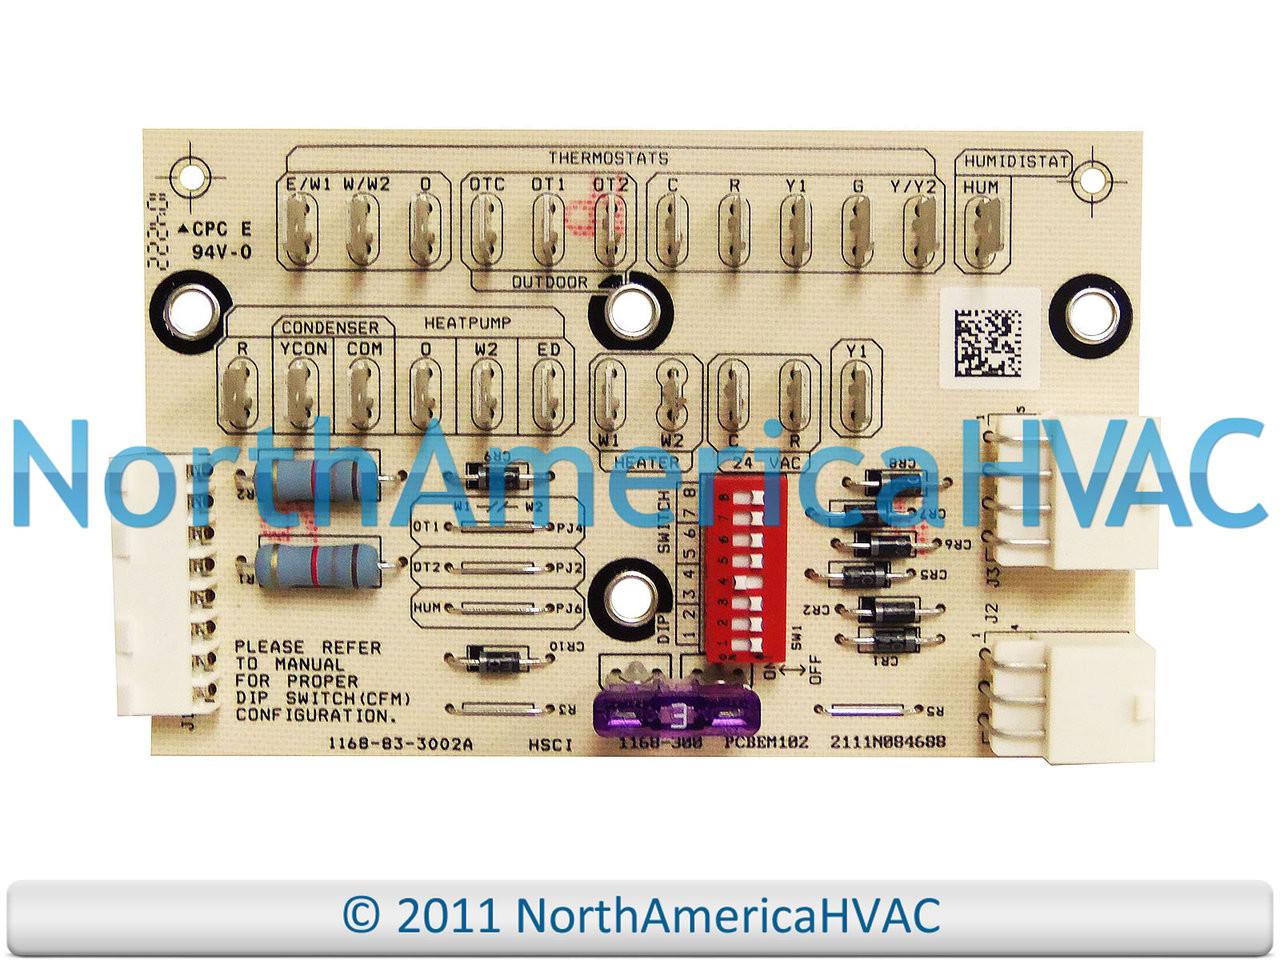 Oem Goodman Amana Furnace Ecm Blower Control Board Pcbem102 Wiring Diagram Pcbem102s